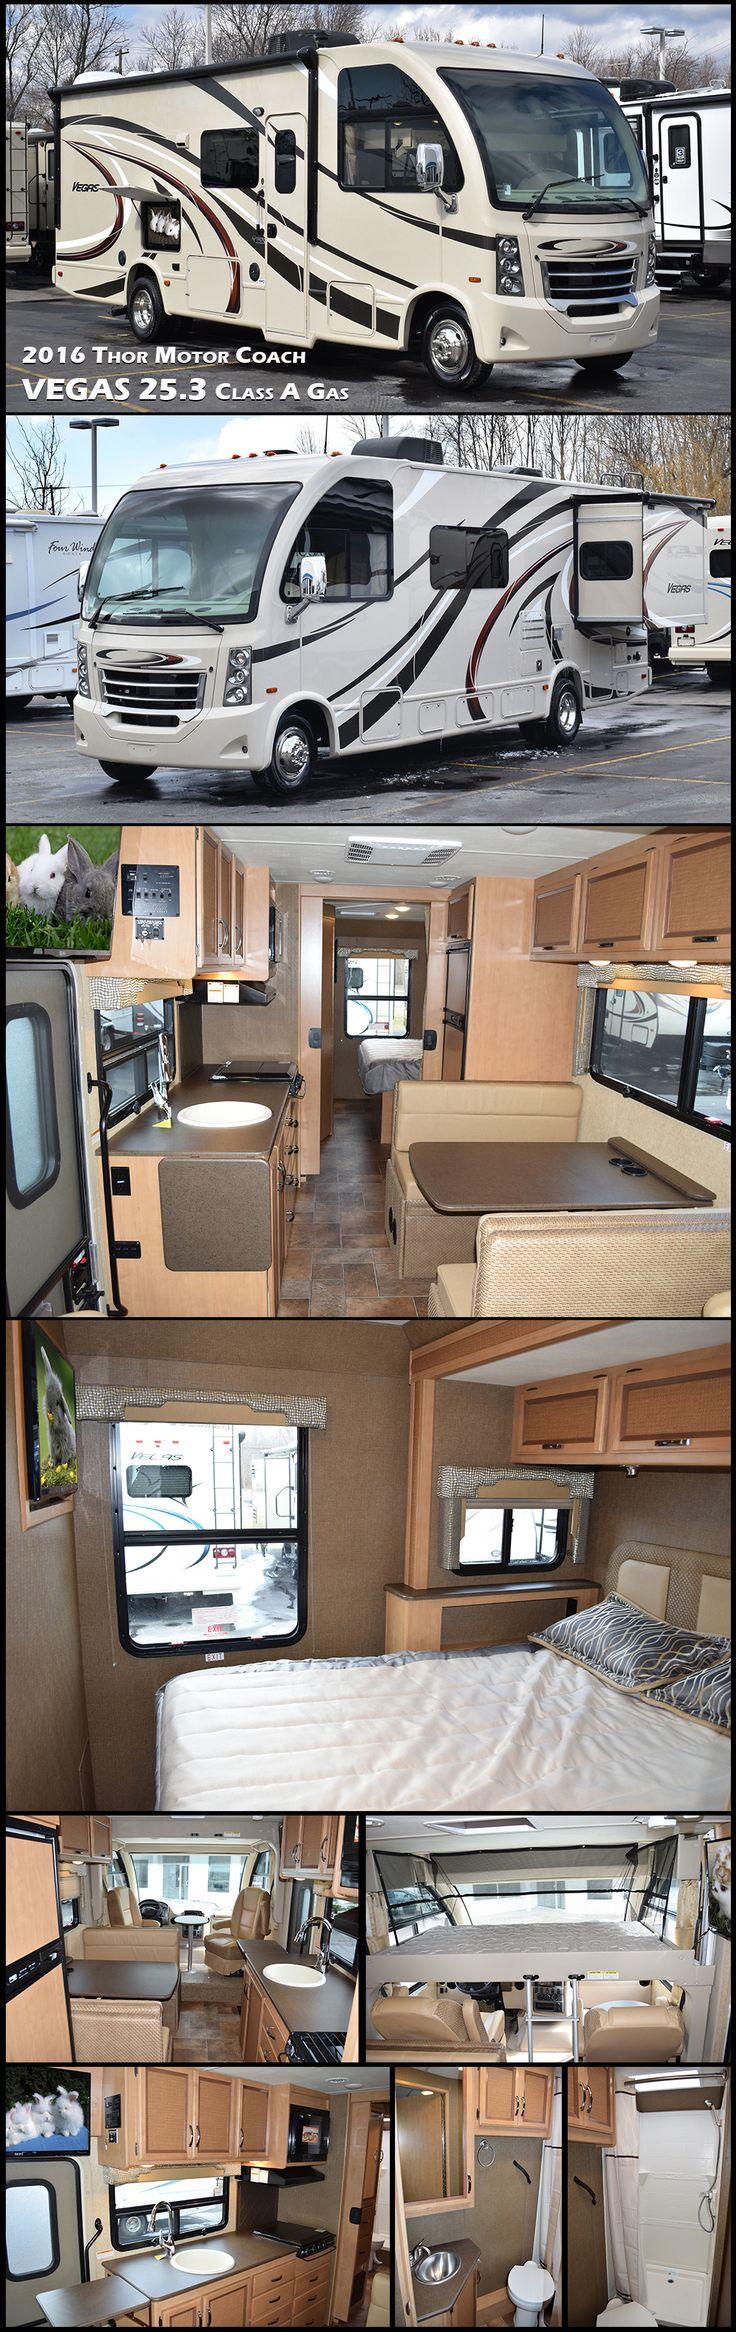 Rv curtains motorhome class a - The 2016 Thor Motor Coach Vegas 25 3 Class A Motorhome Is An Ruv Featuring A Rear